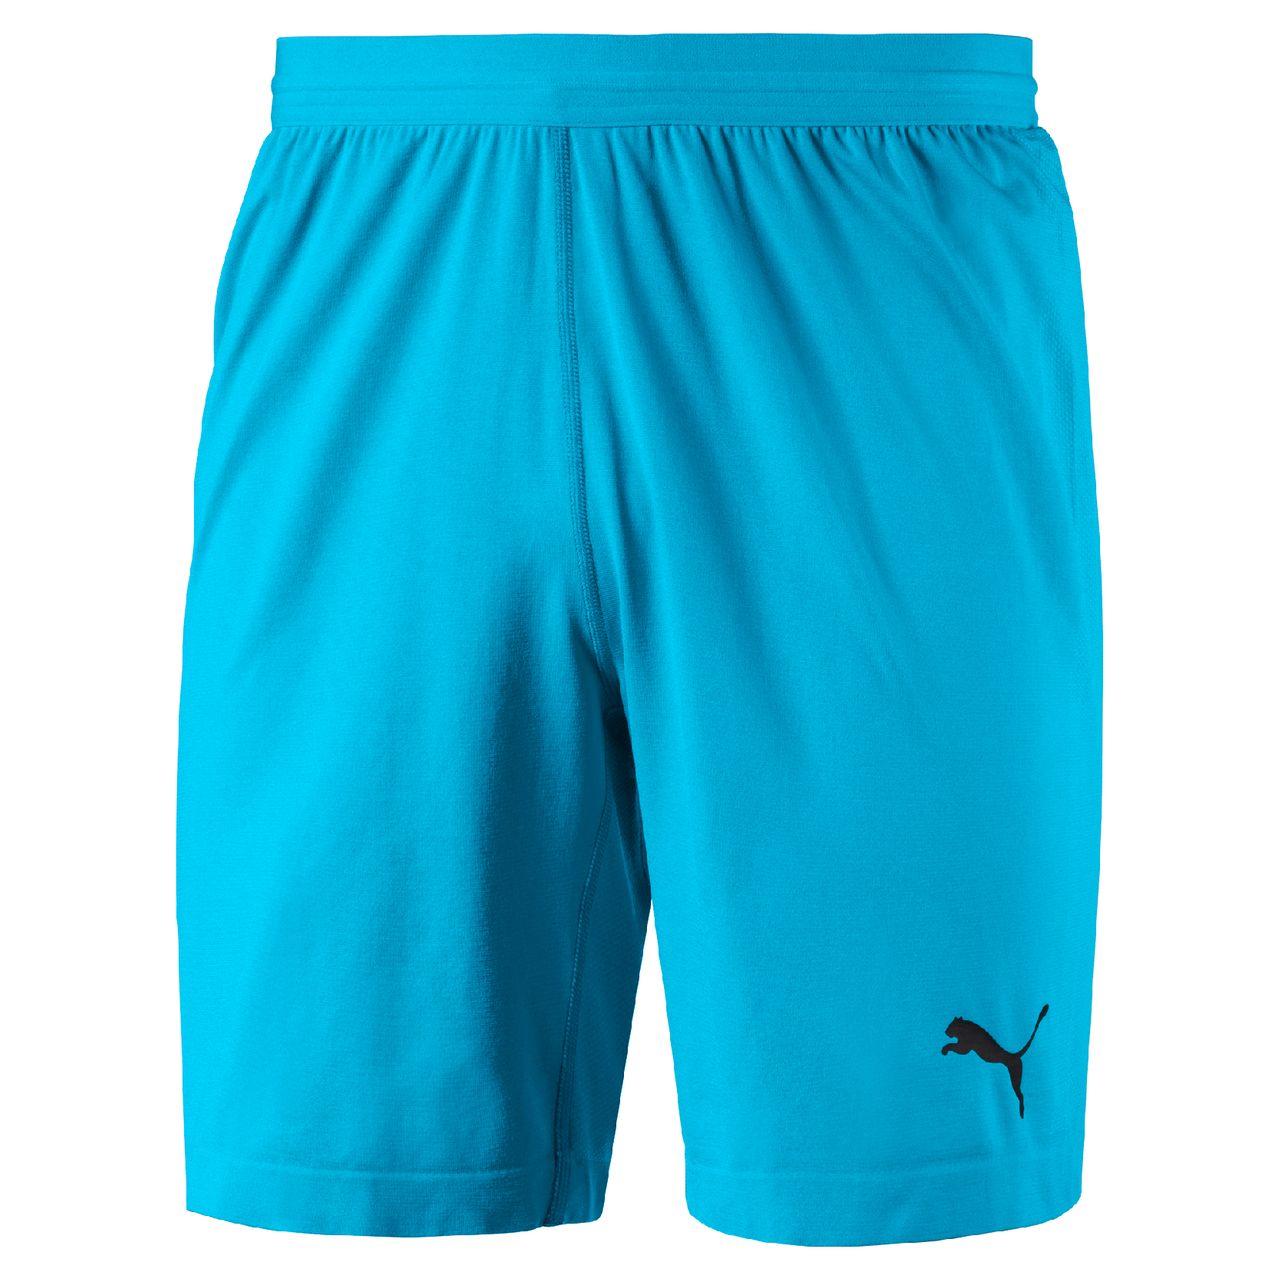 PUMA FINAL GK Shorts